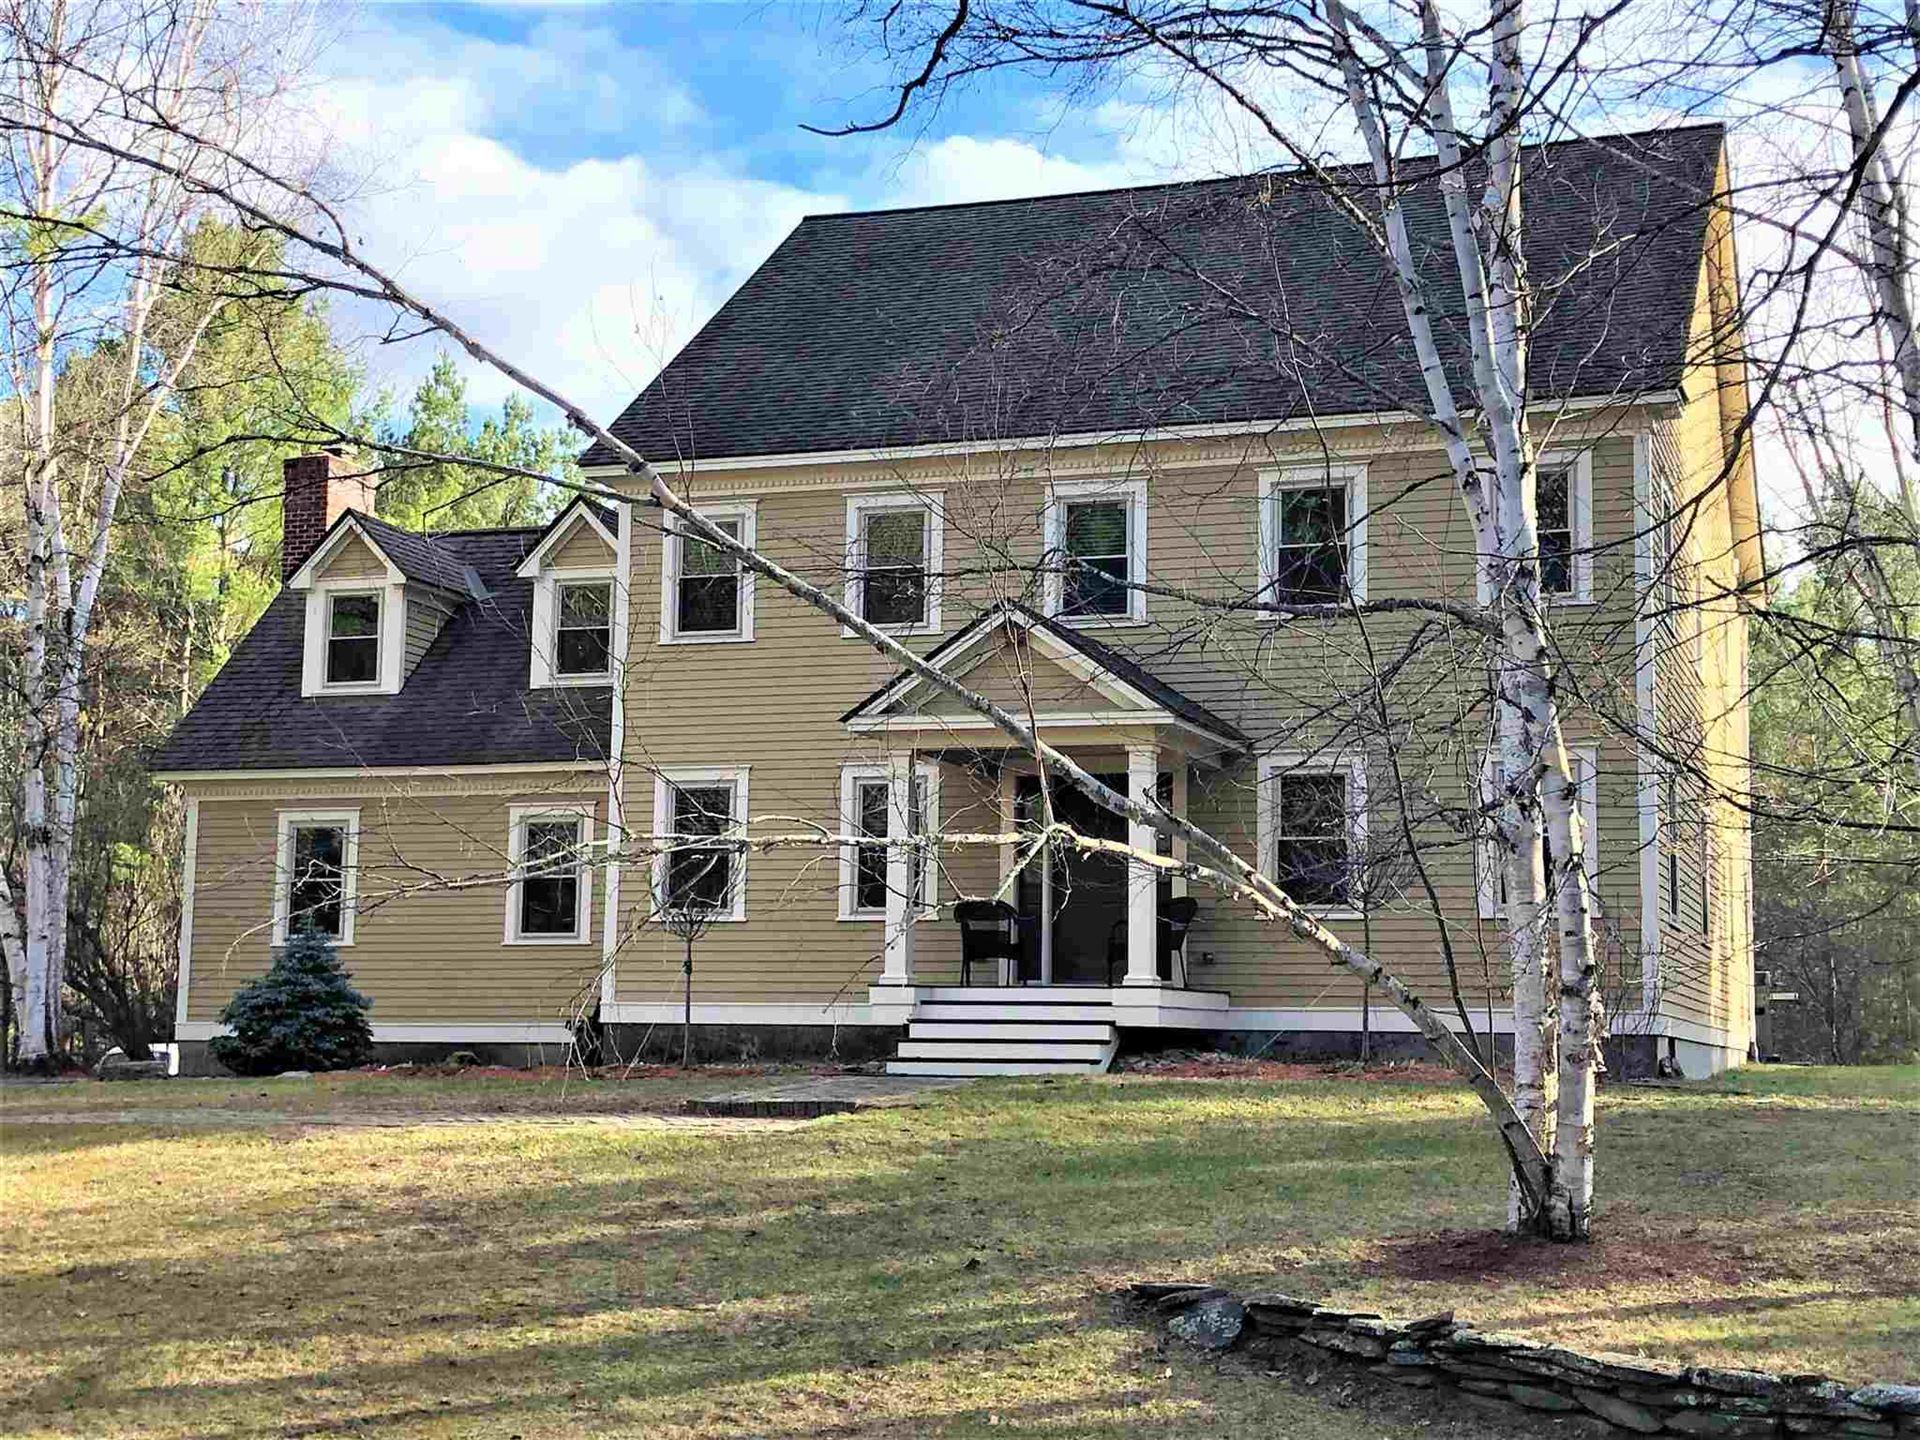 575 Farmer Drive, Saint Johnsbury, VT 05819 - MLS#: 4848746